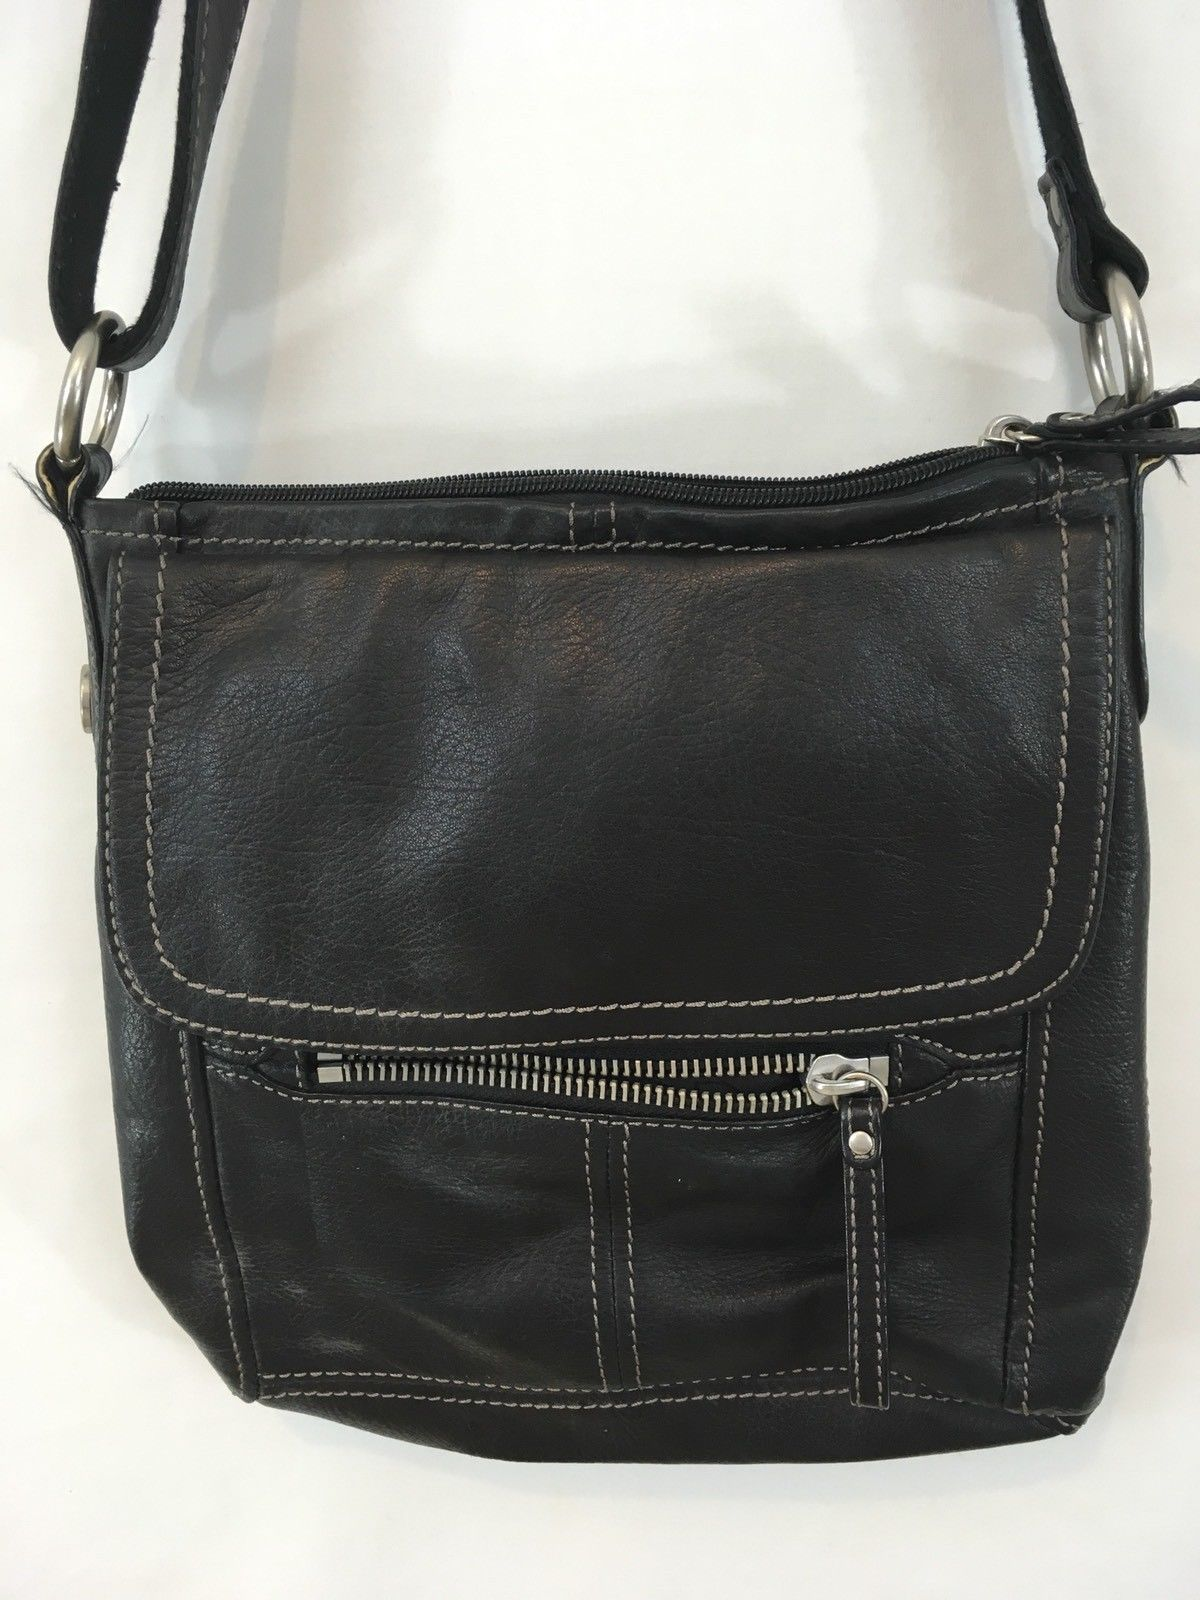 ce5ce6e823dd S l1600. S l1600. Previous. Fossil Issue No. 1954 Long Live Vintage Black  Leather Satchel Tote Purse Handbag